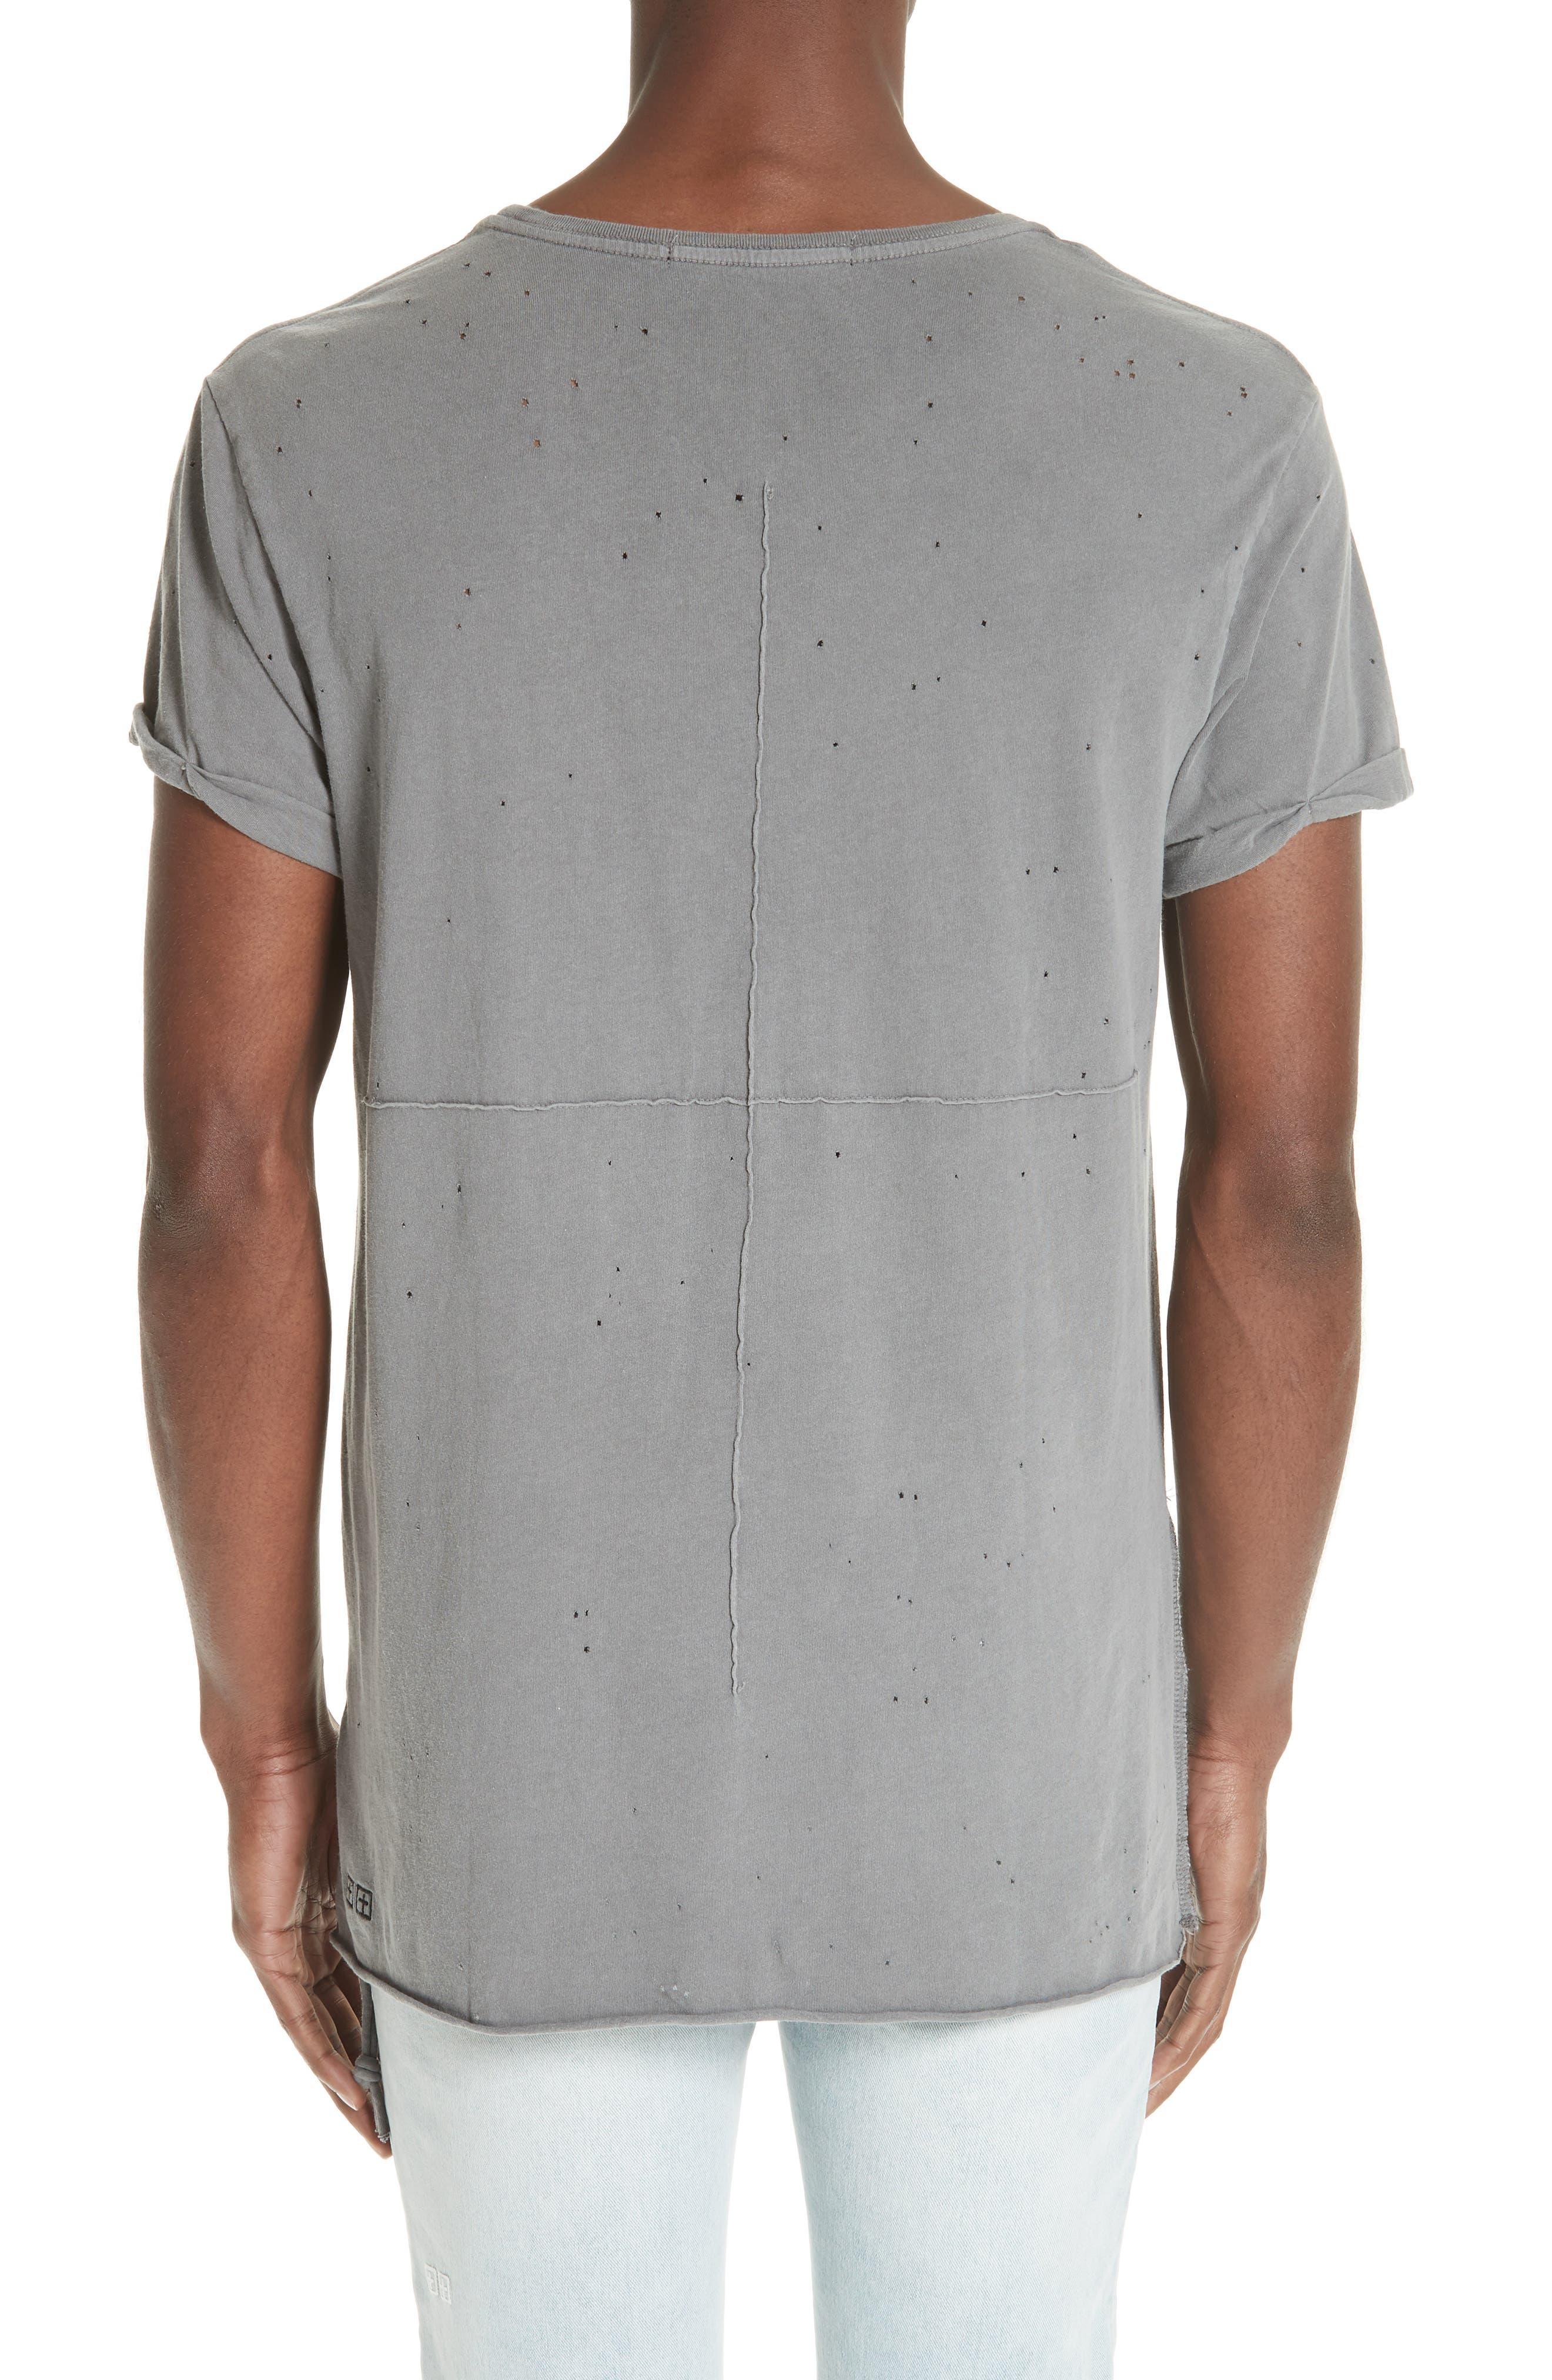 Kodeine Distressed T-Shirt,                             Alternate thumbnail 2, color,                             GREY